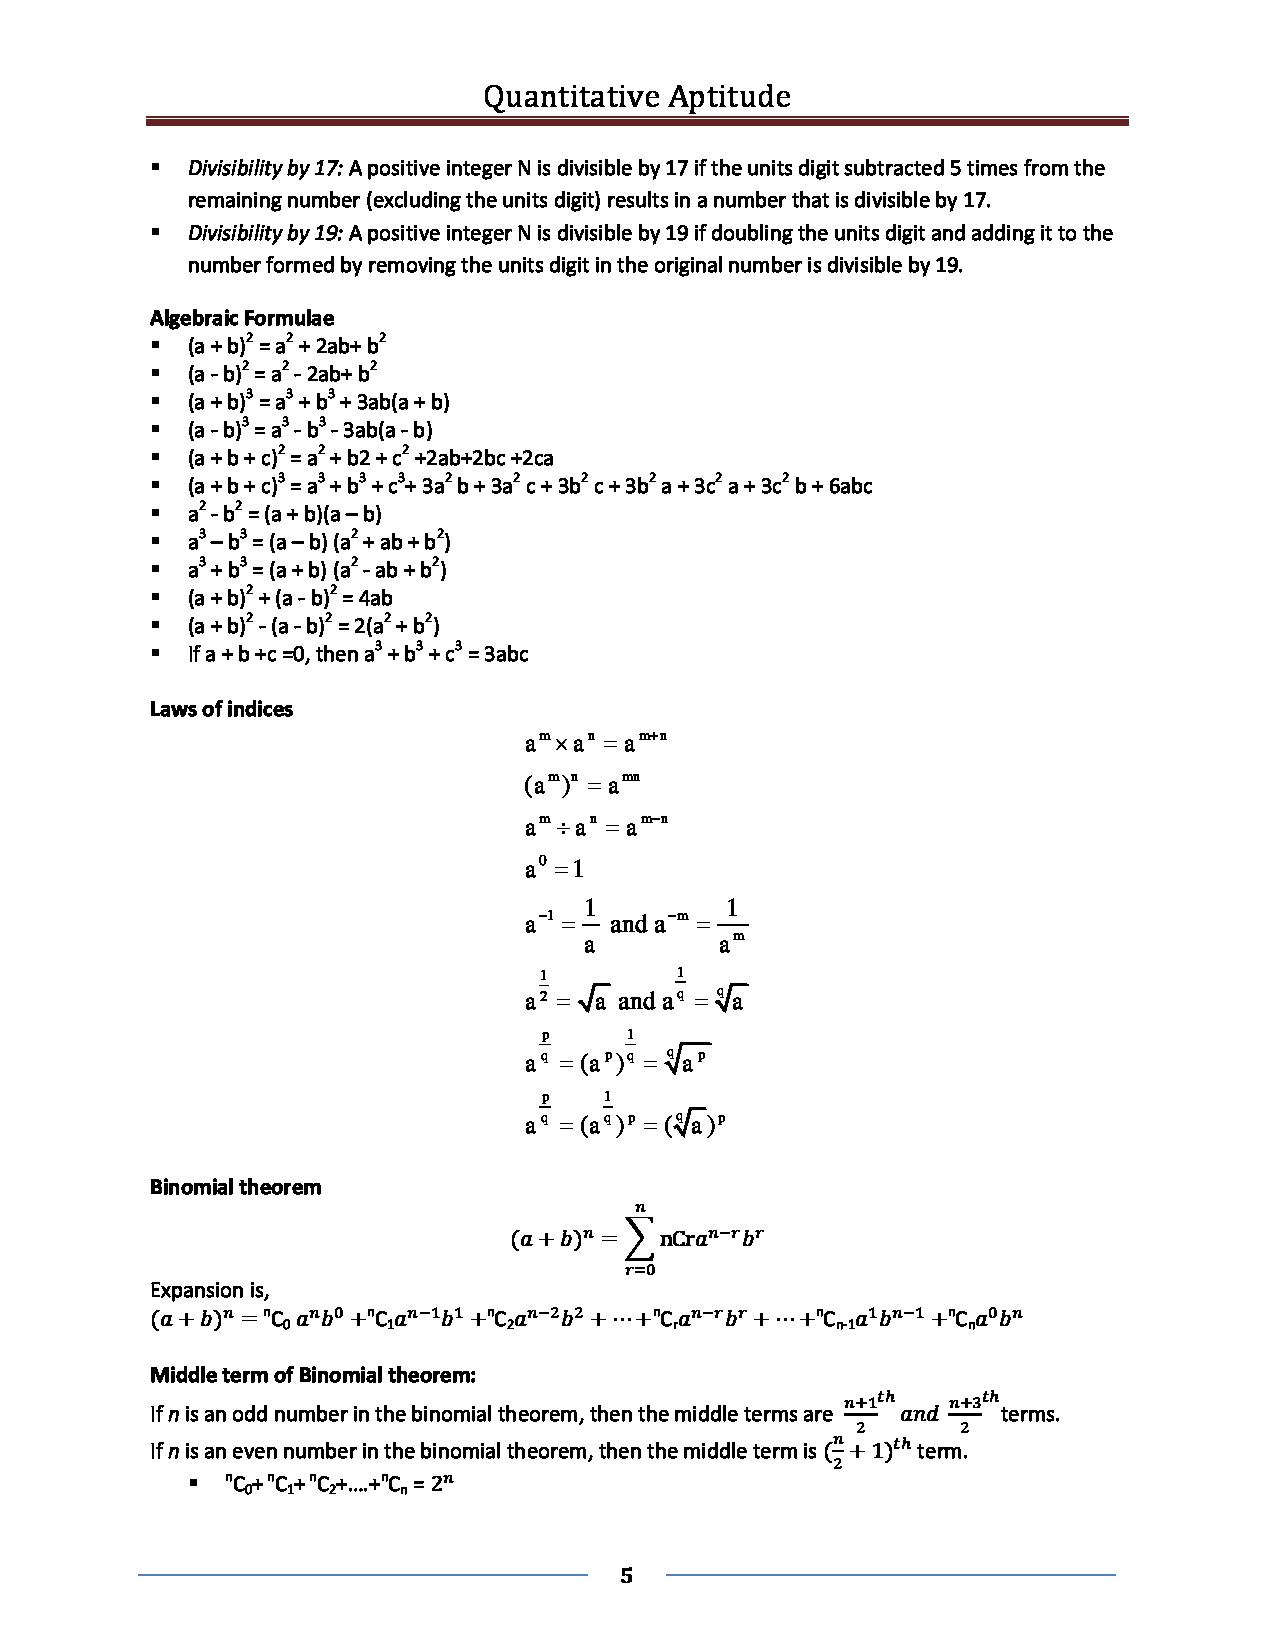 Quantitative Aptitude Formula ebook - Page 5